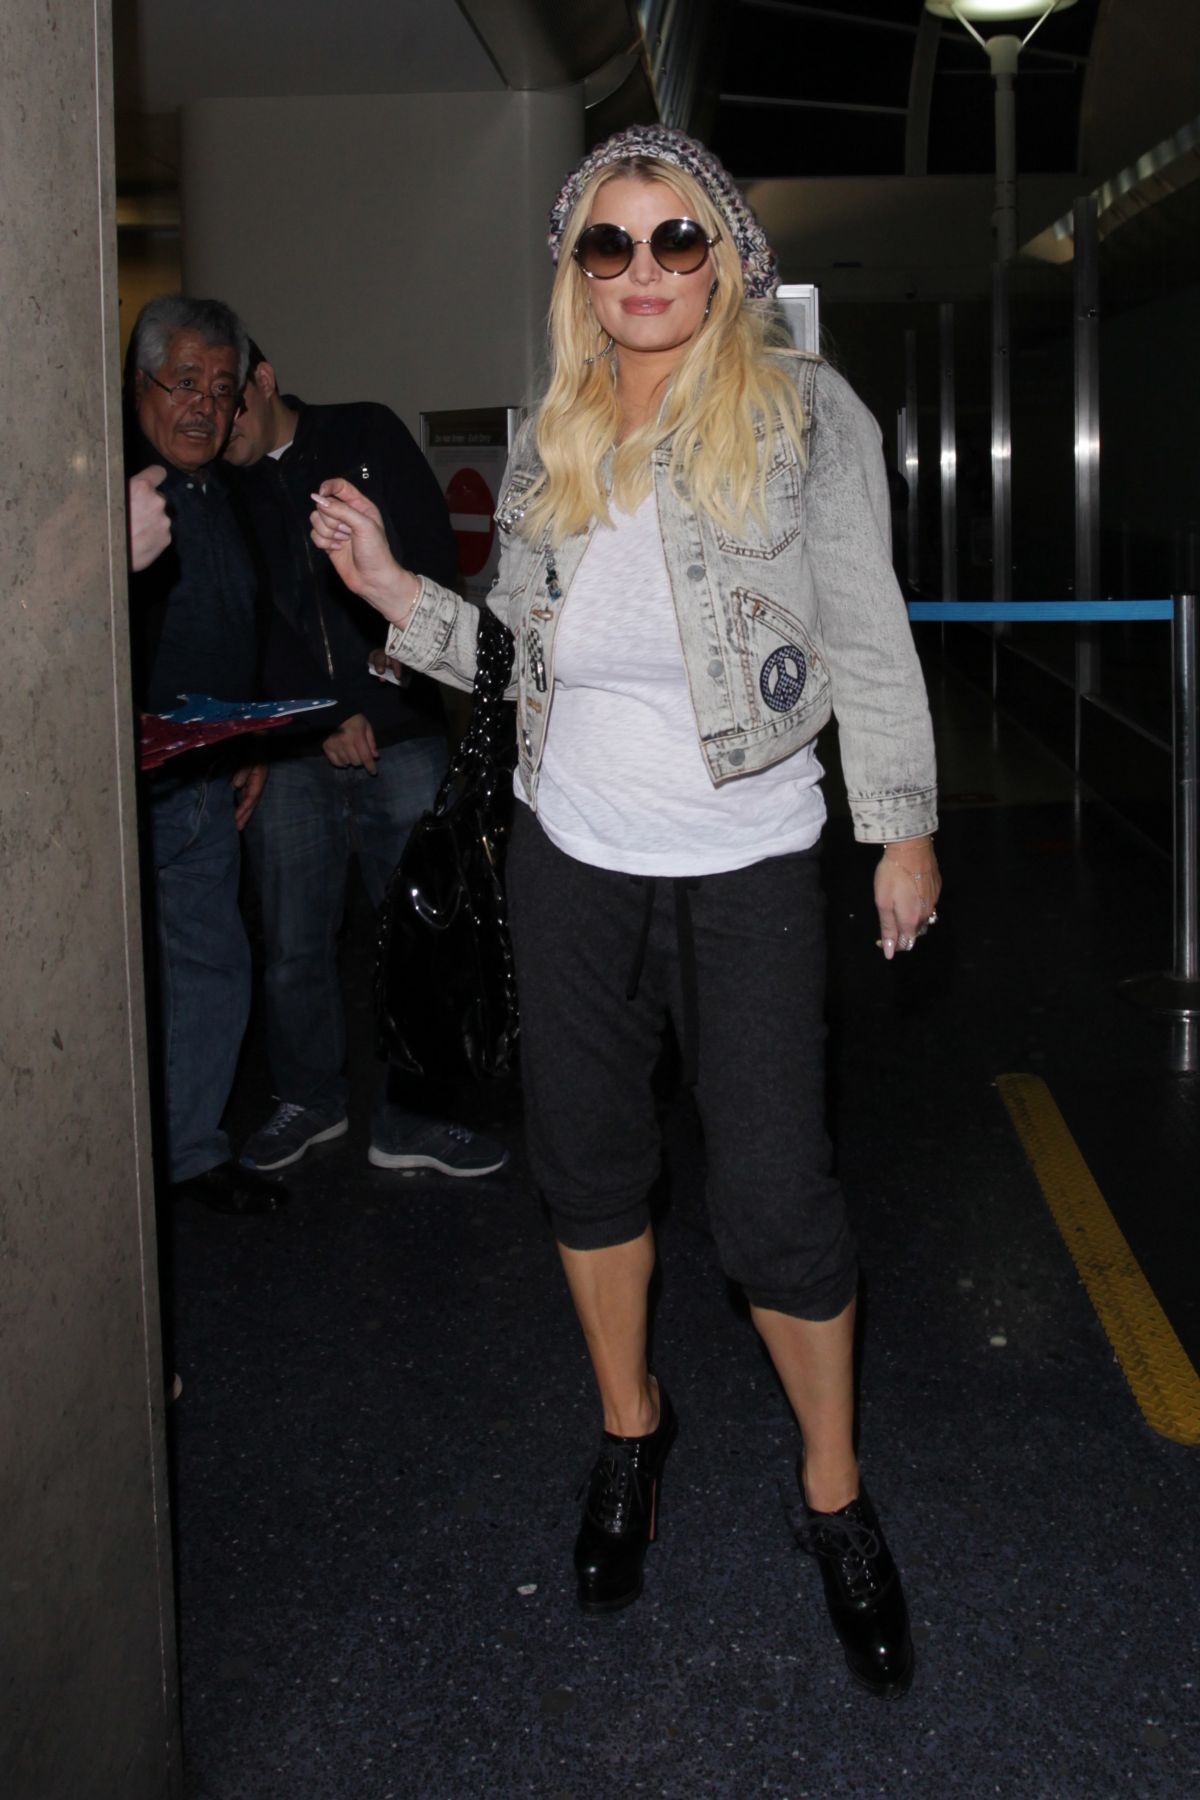 JESSICA SIMPSON at Los Angeles International Airport 01/15/2017